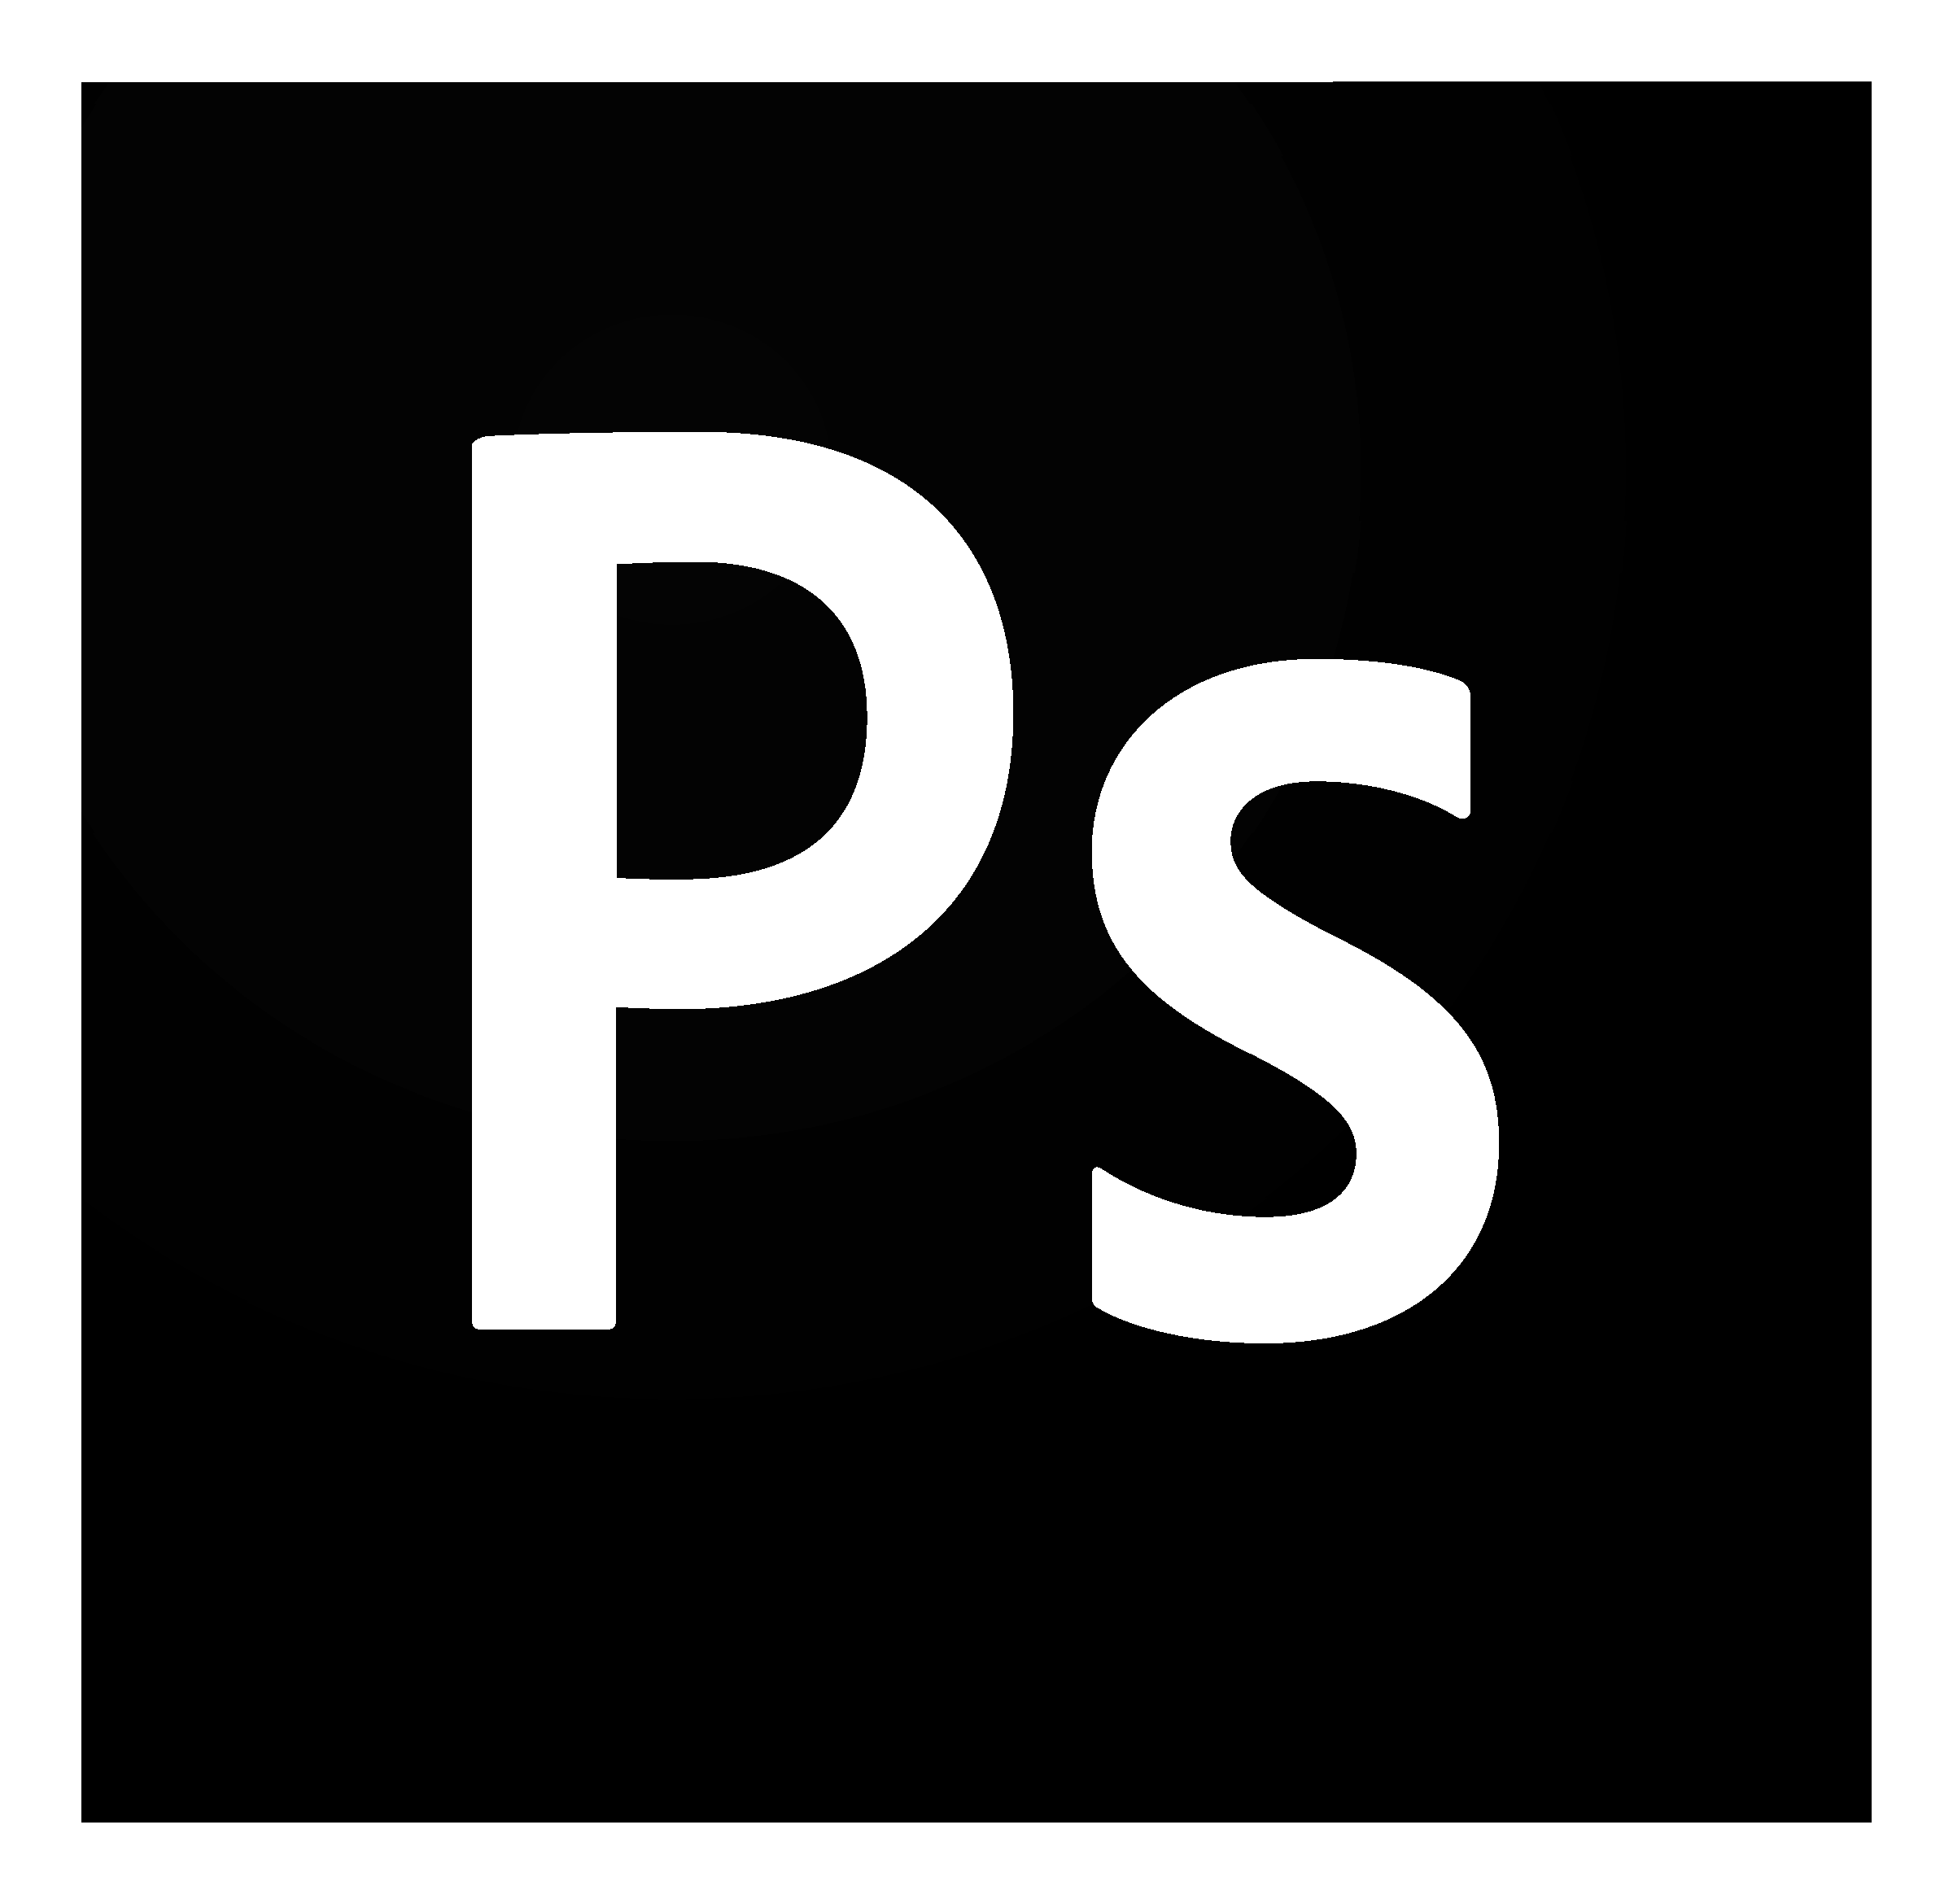 Photoshop CC Logo PNG Transparent & SVG Vector - Freebie ...